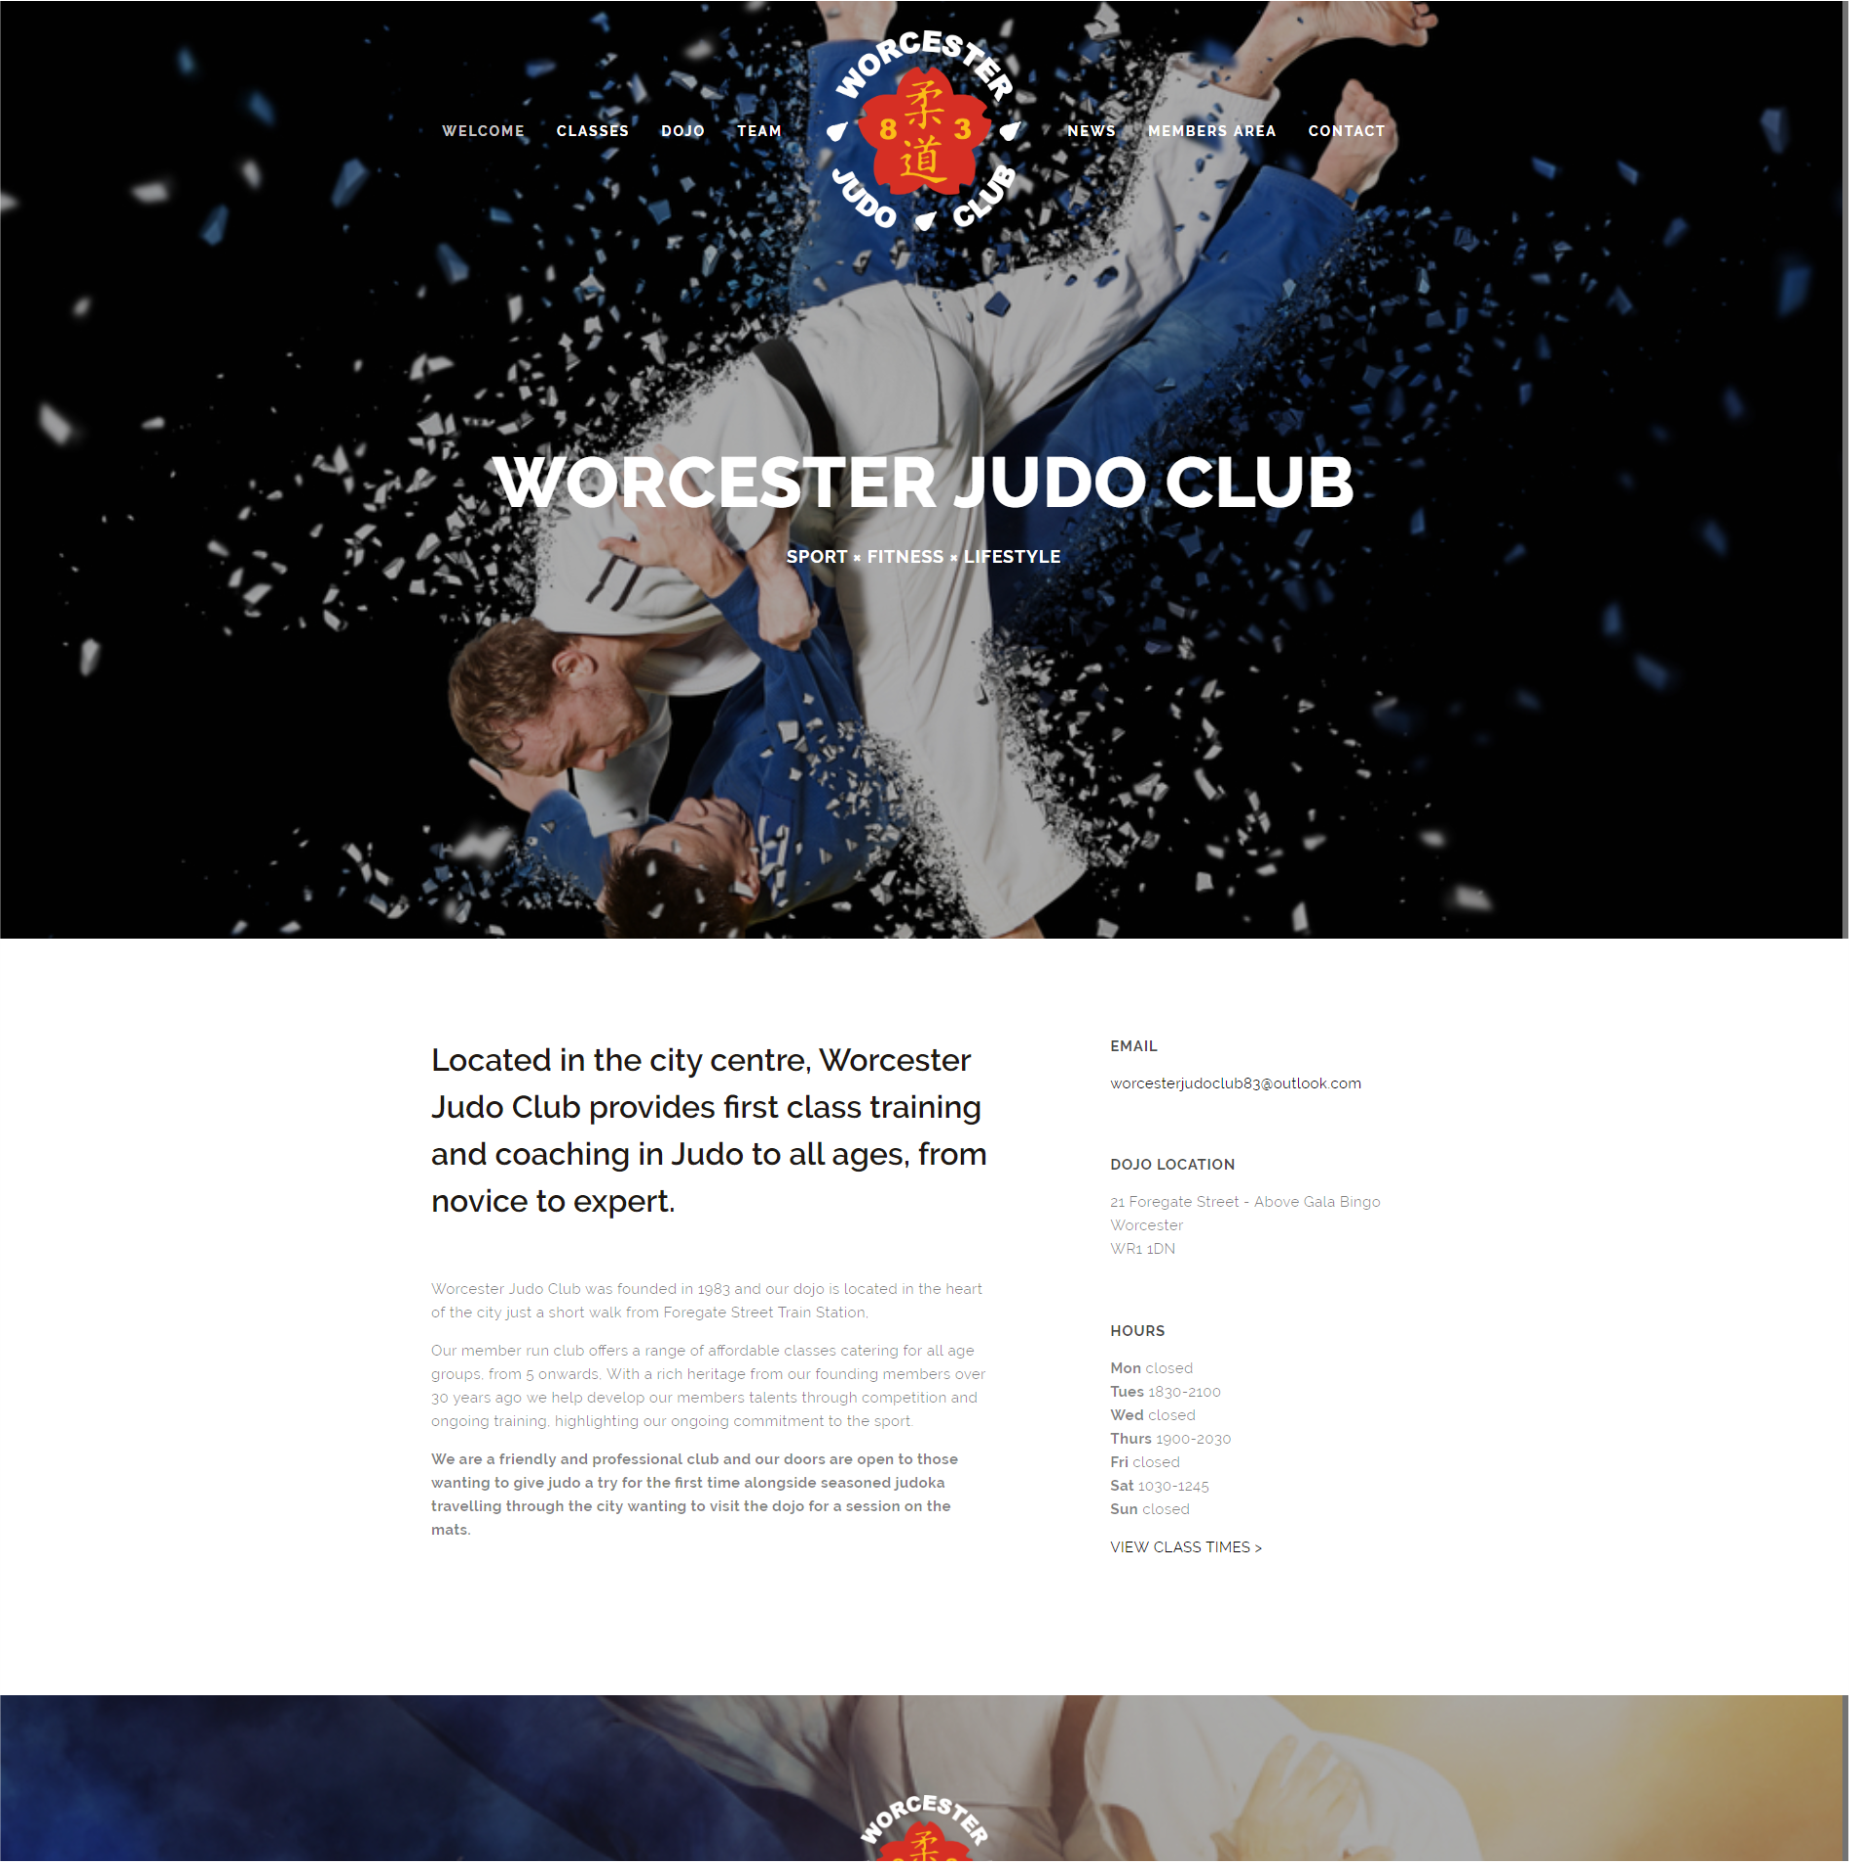 Worcester-judo-club-website-designer-malvern-worcestershire-uk-red-penguin